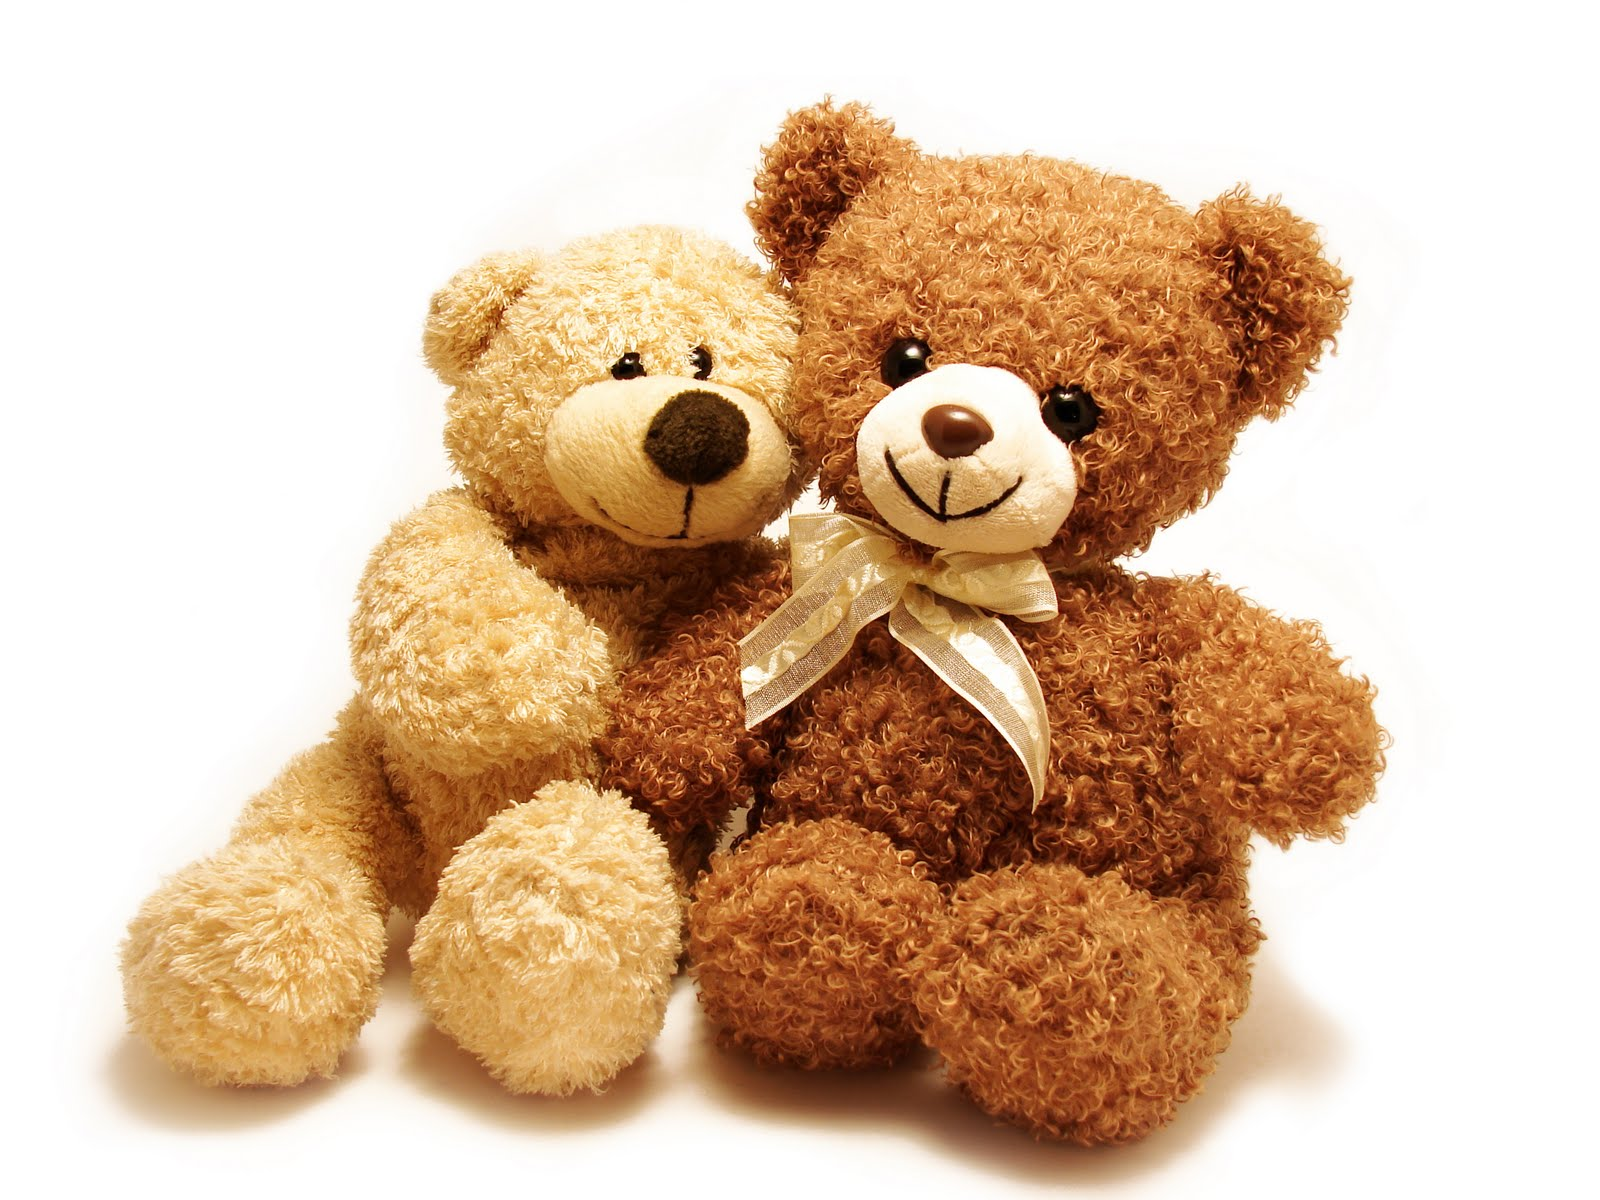 http://www.digitalhdphotos.com/2013/02/teddy-bear.html